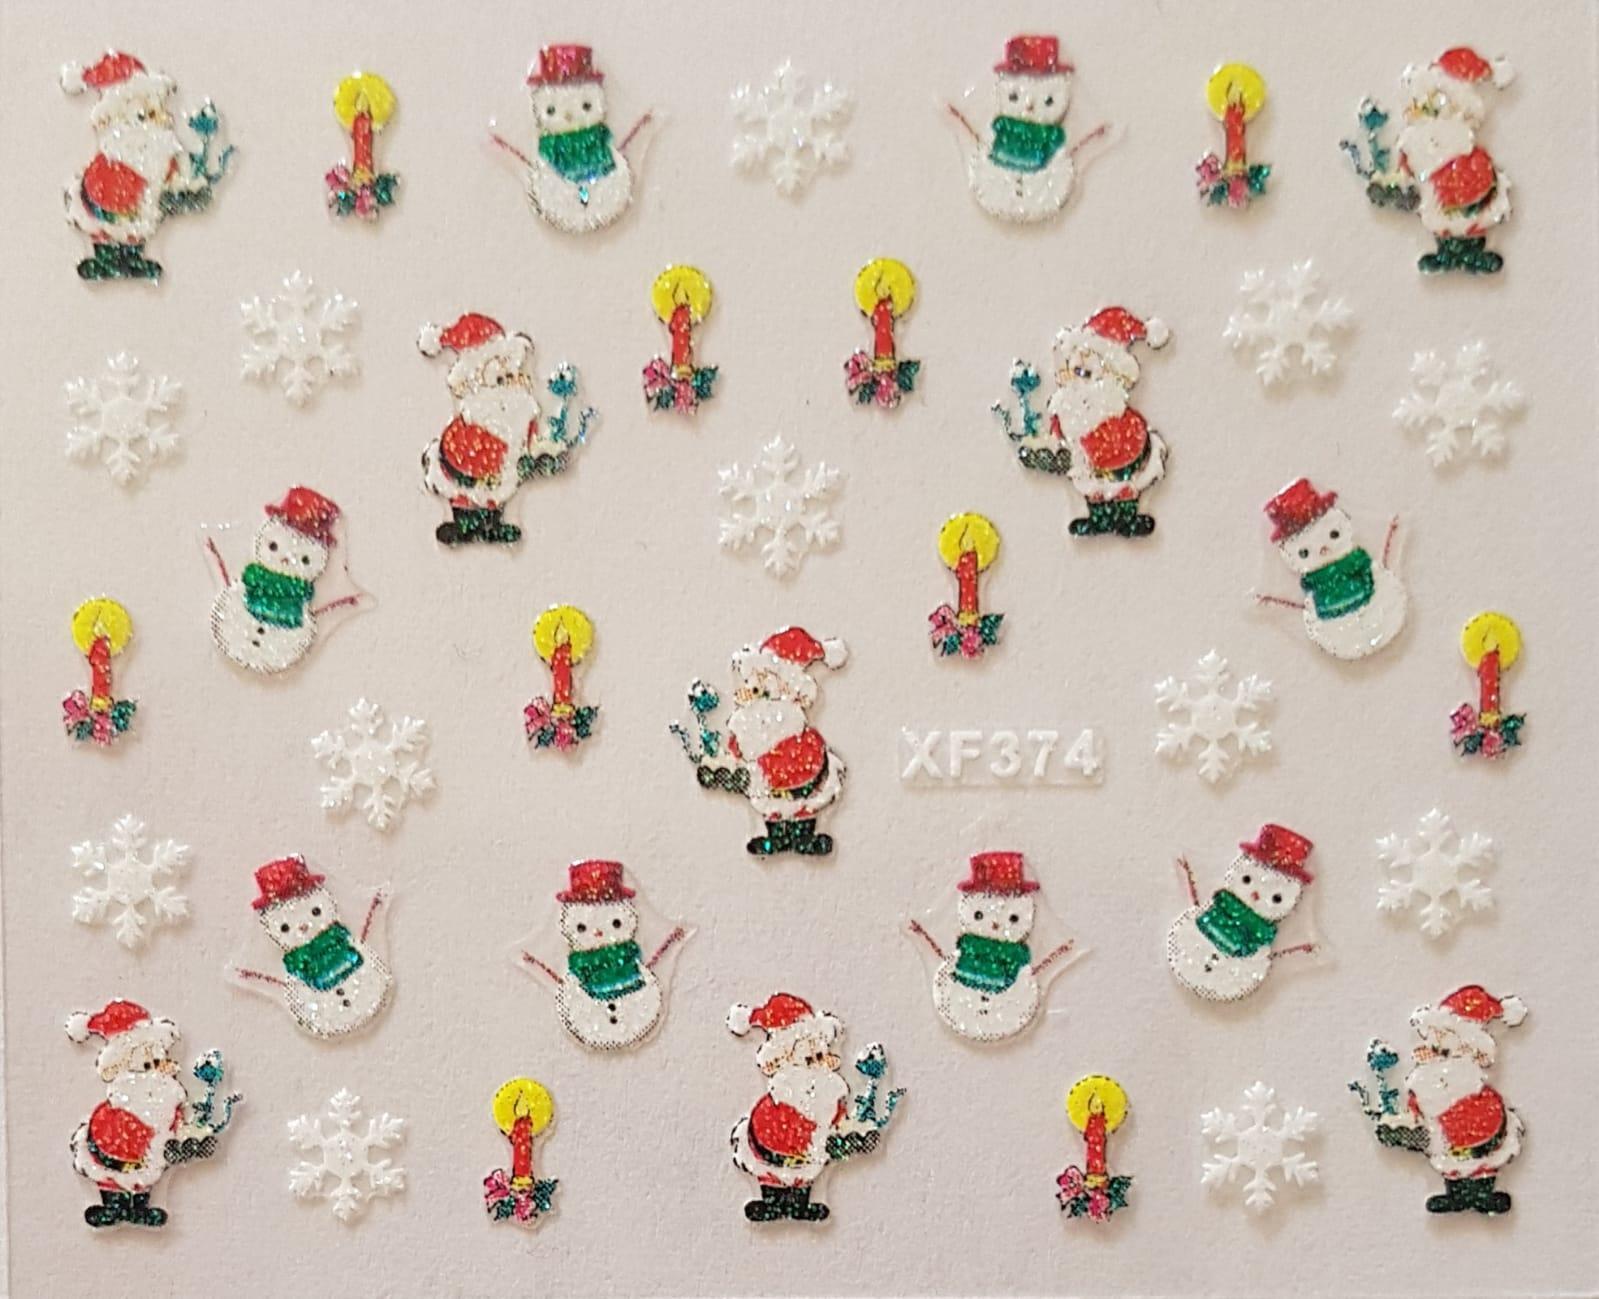 Stickers navideños xf-374